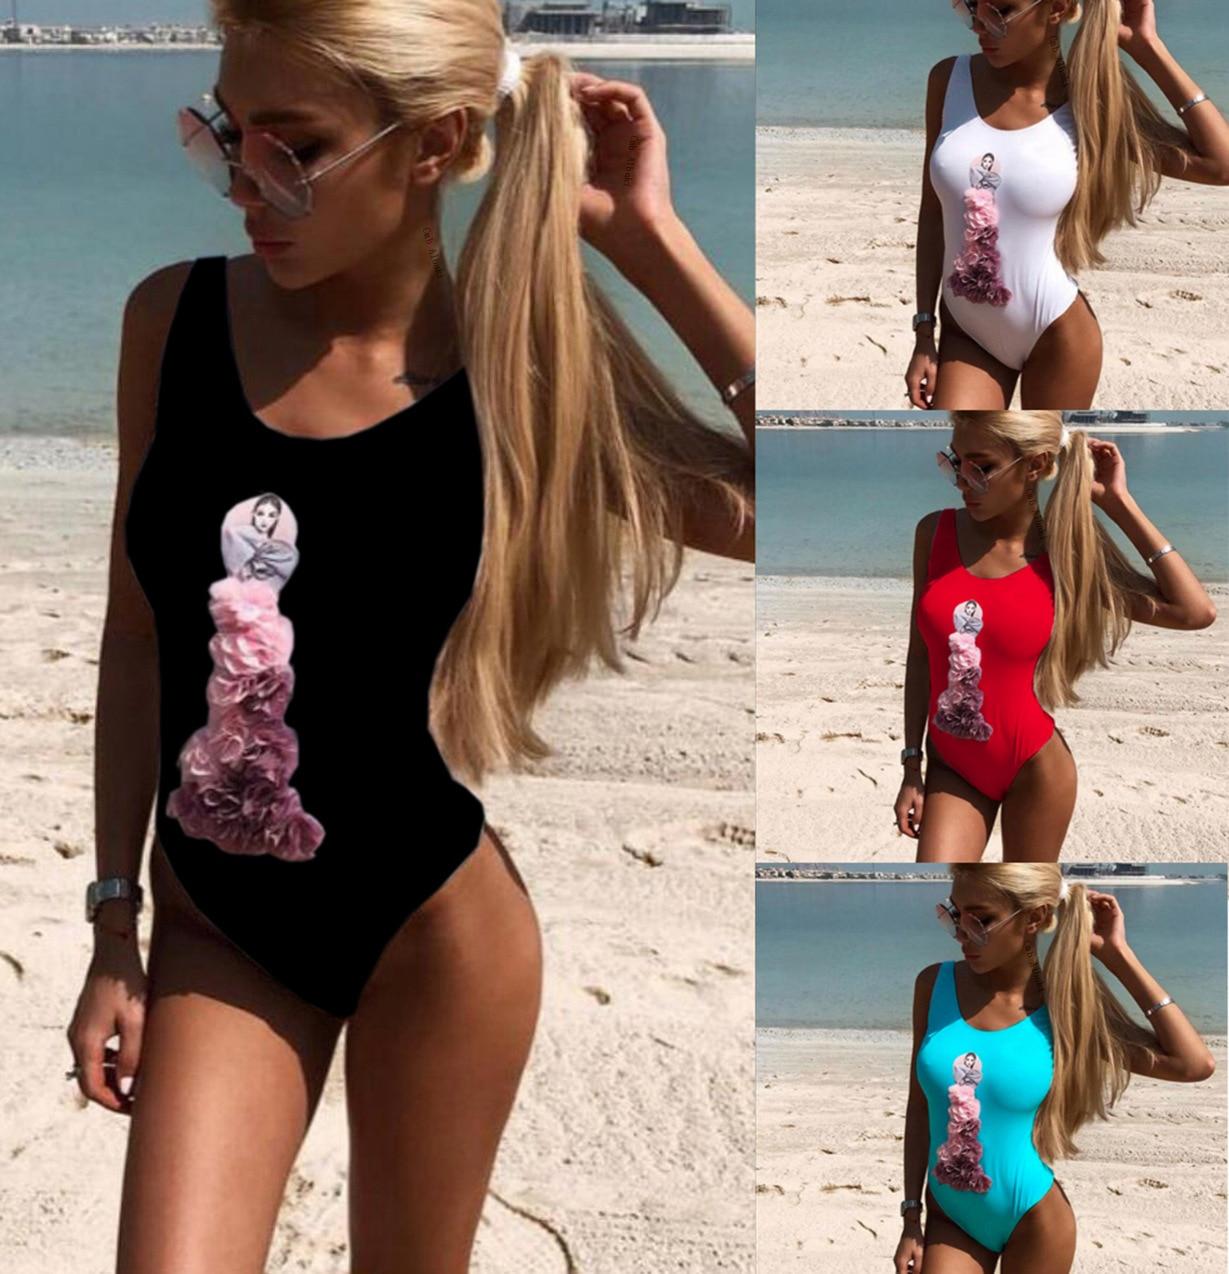 Sports & Entertainment Phaixoneible 2019 New One Piece Swimsuit Women Swimwear Sexy Monokini Push Up Bathing Suit Female Trikini Lady Beachwear